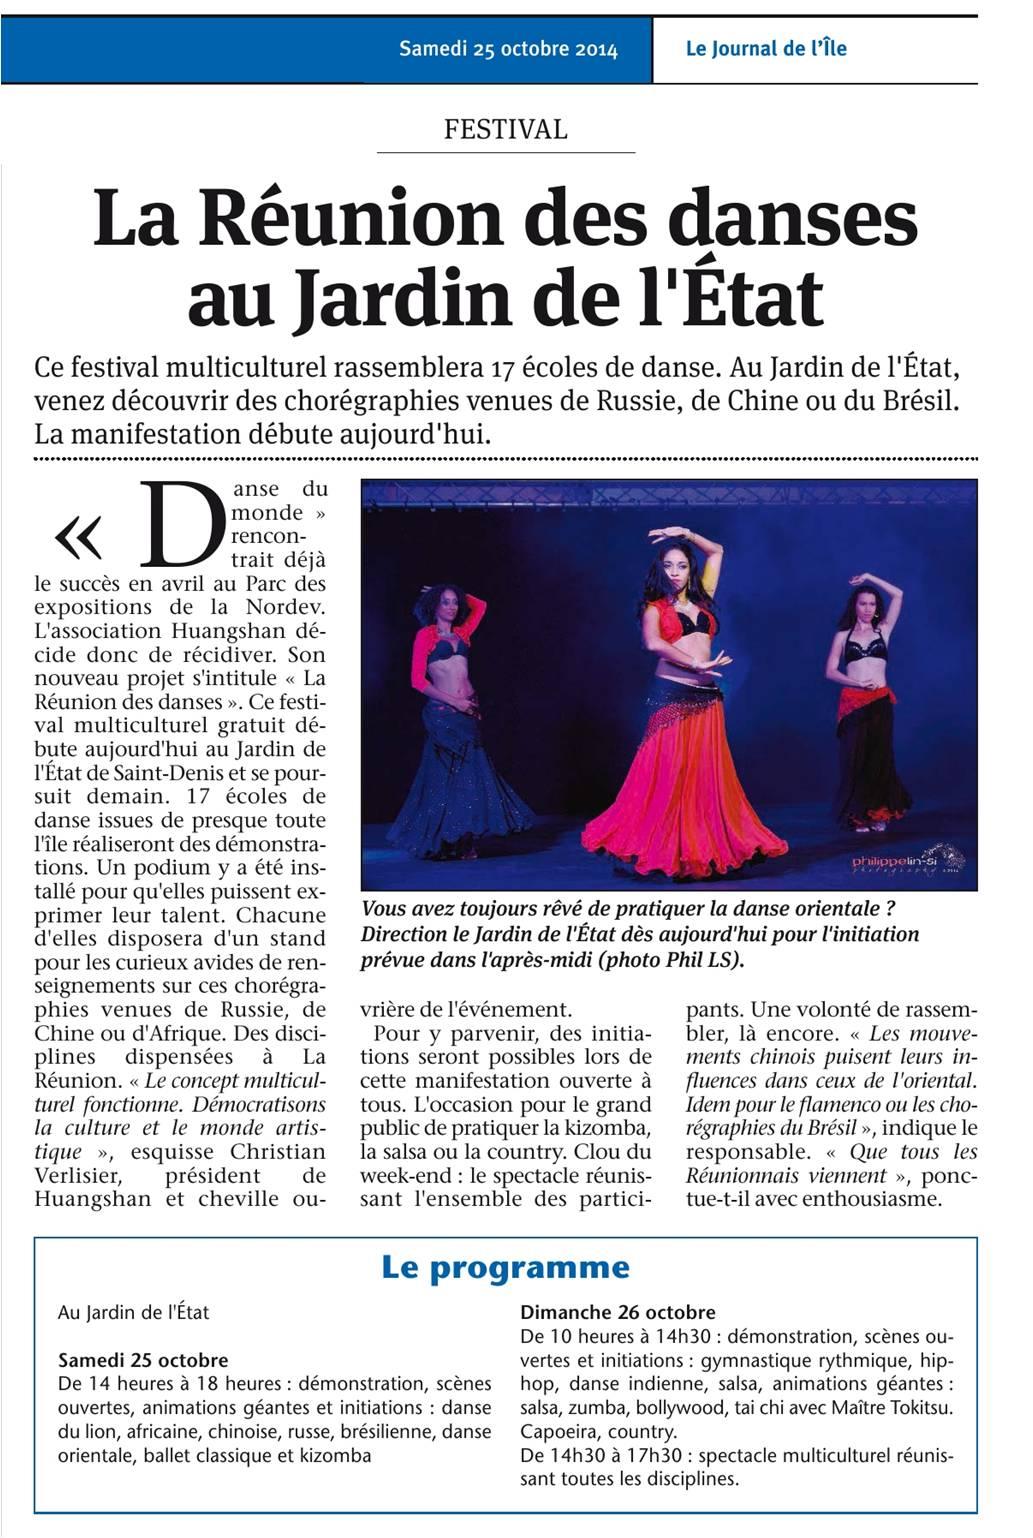 Page 16.JIR_DU_25-10-2014 ok 3